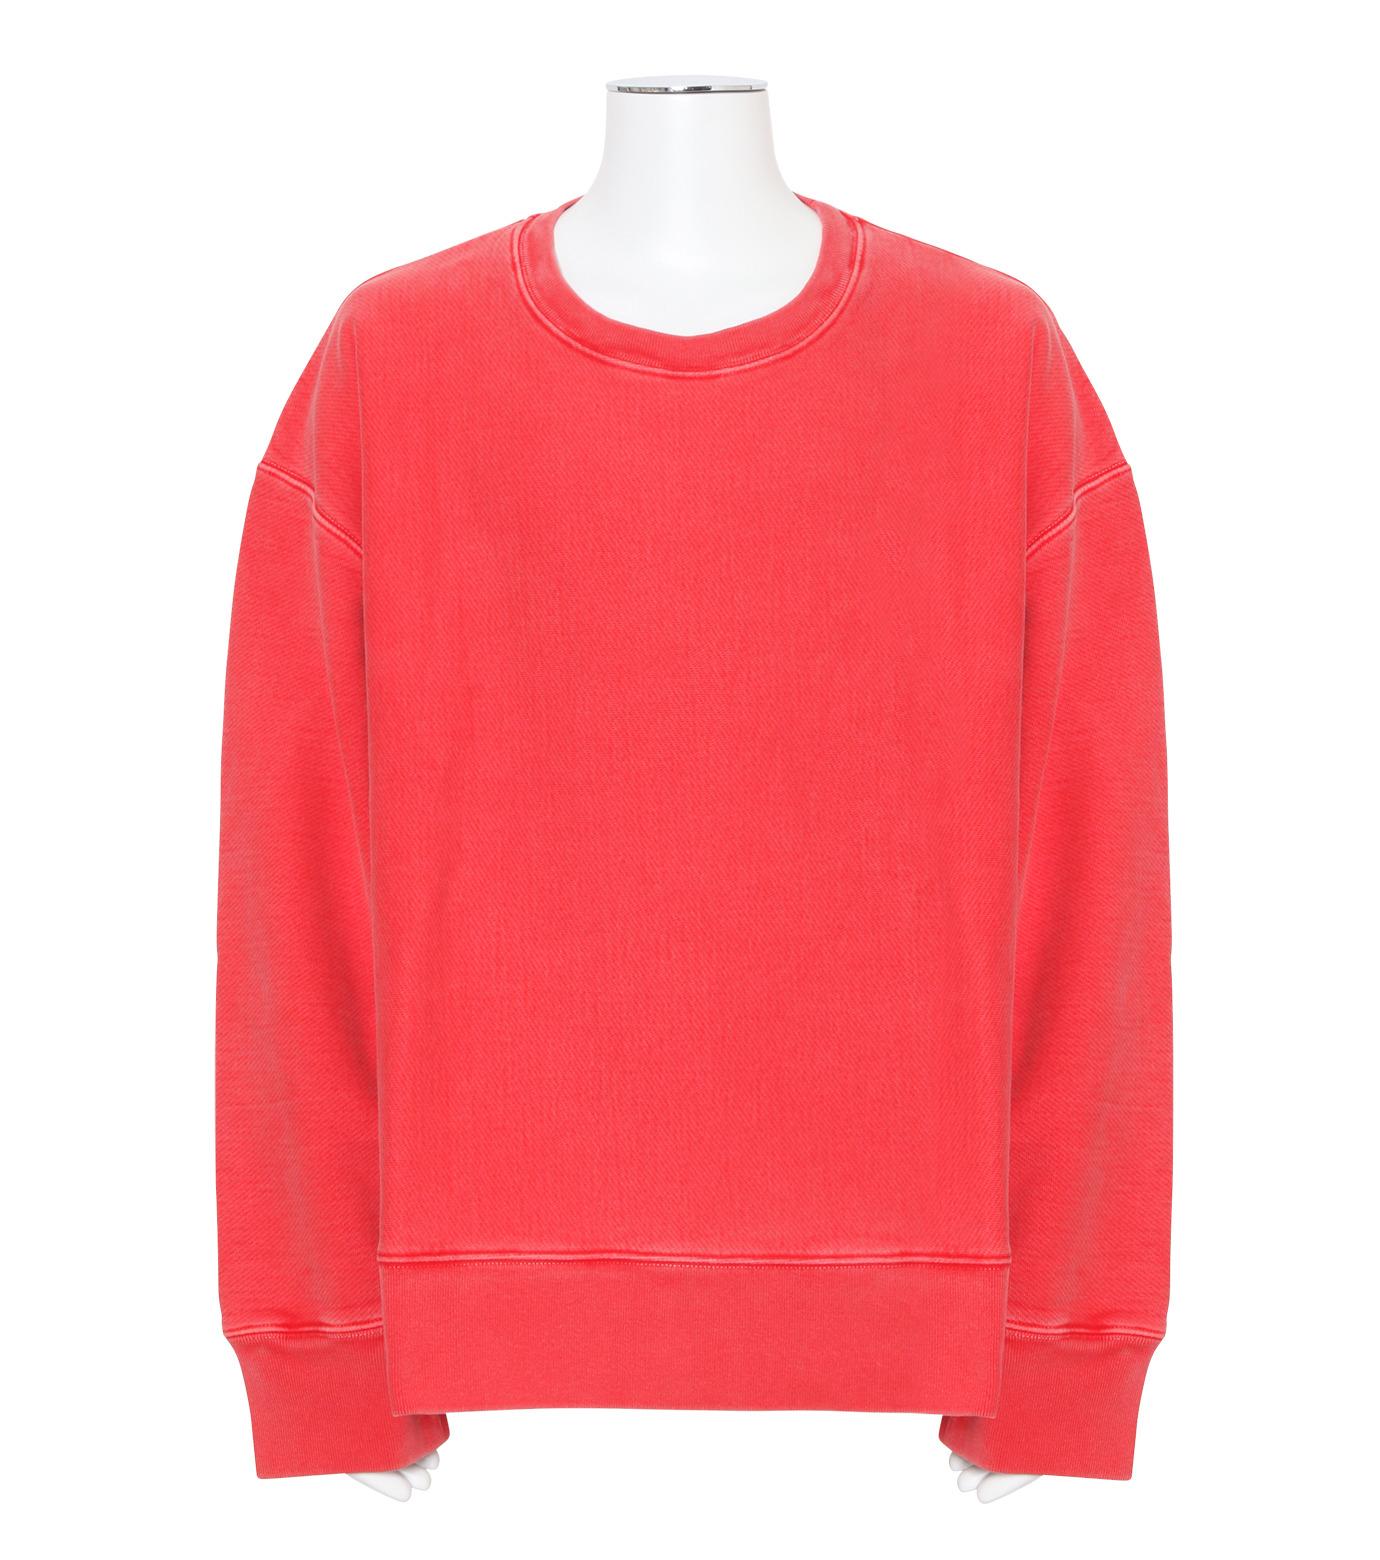 YEEZY(イージー)のCREWNECK SWEATSHIRT-RED(カットソー/cut and sewn)-KW3M209-107-62 拡大詳細画像1